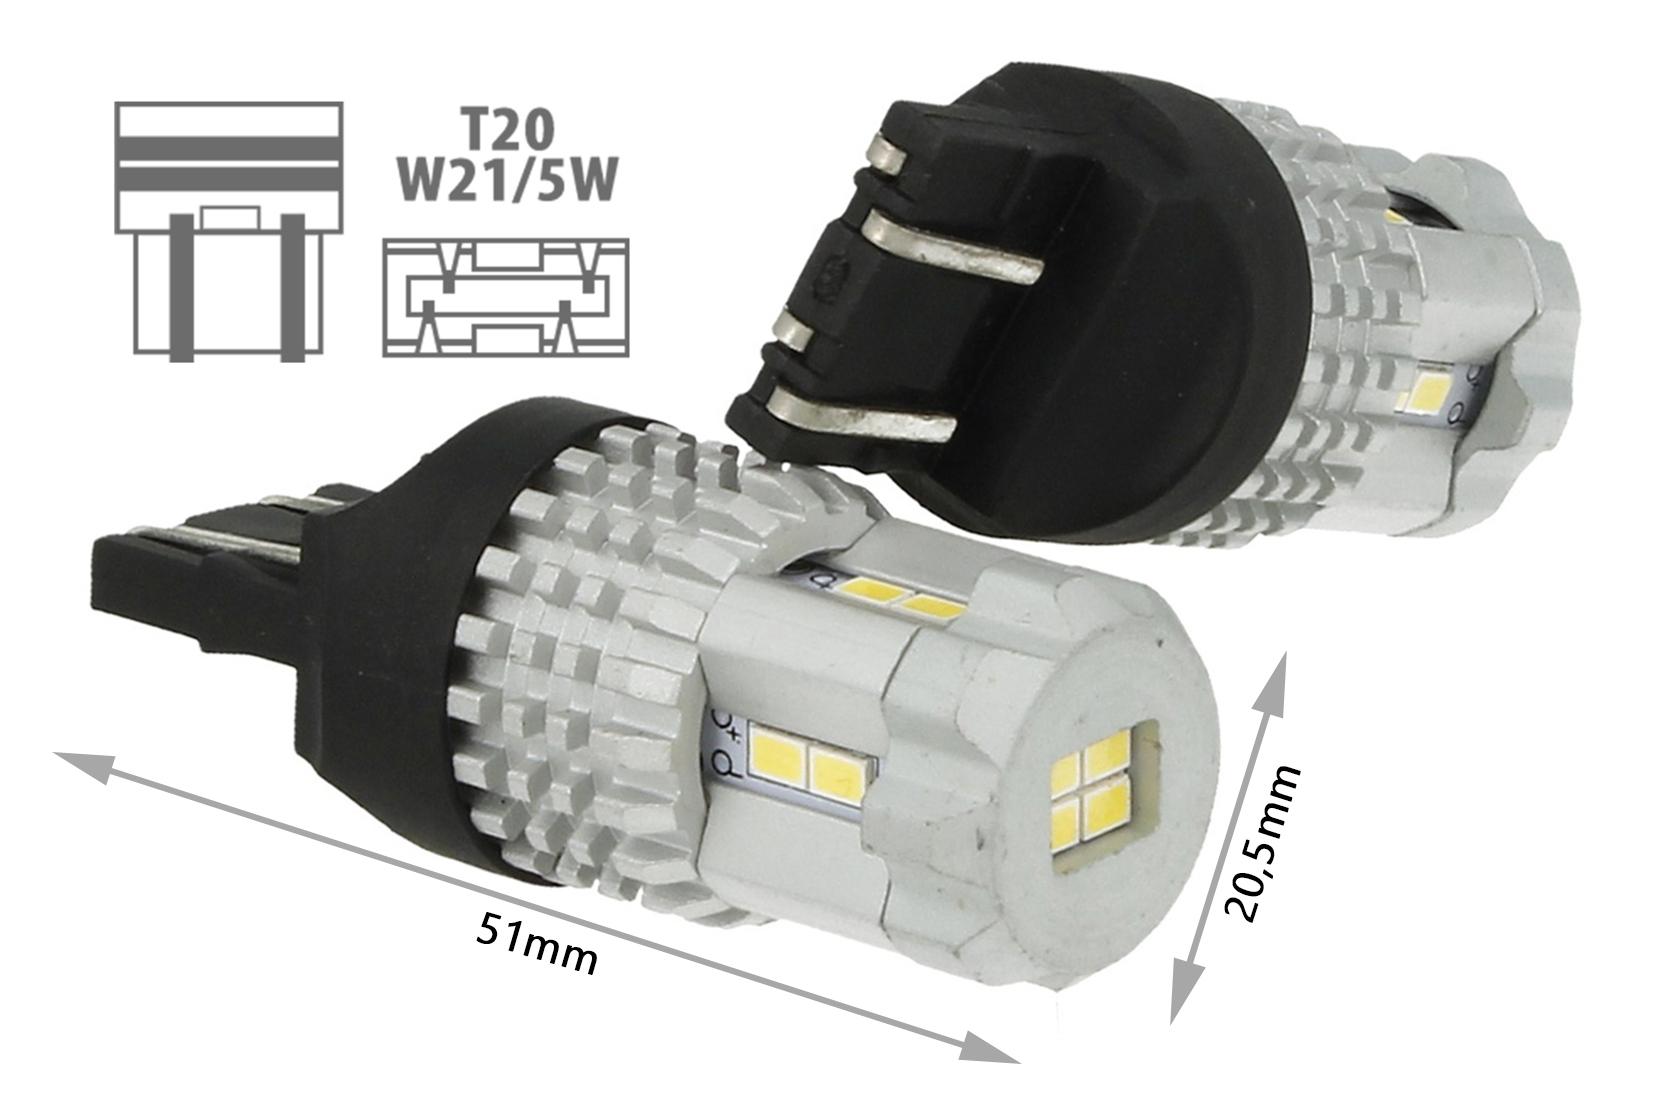 Lampadina Luci Diurne Fiat 500 : Lampada led t20 7443 w21 5w 12 smd 3020 bianco super luminoso luci